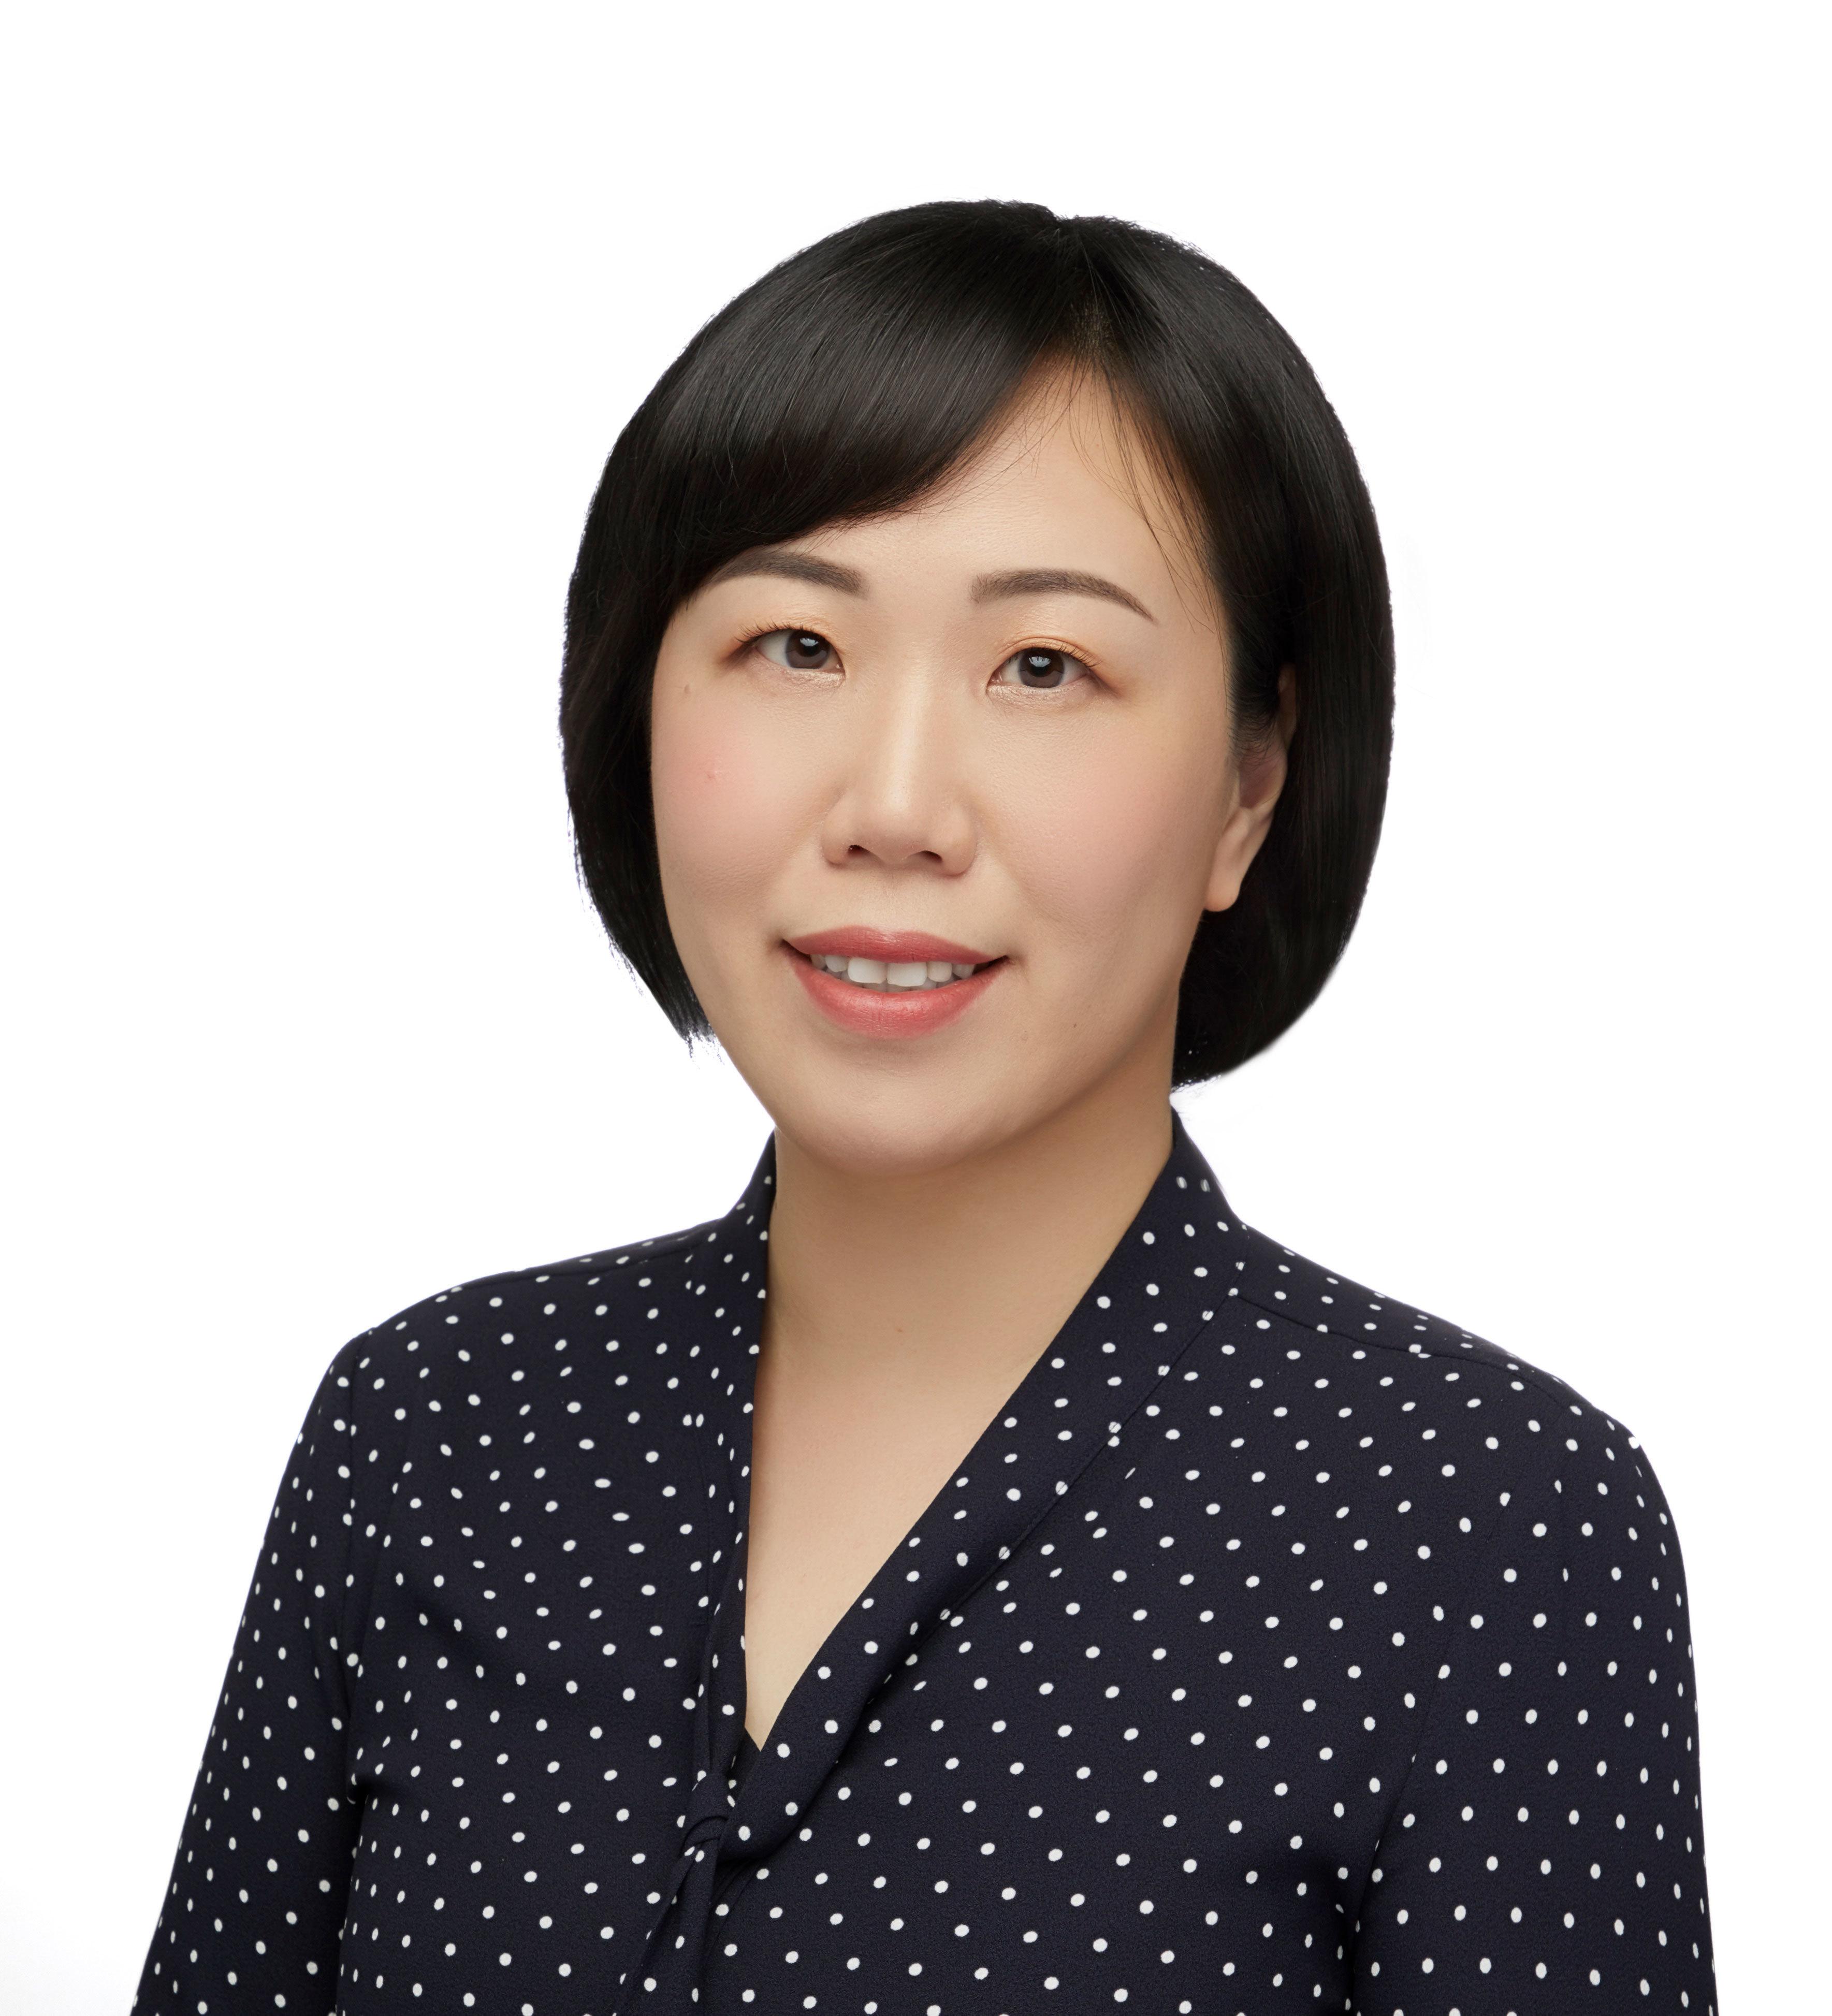 何漢葳 Han-Wei Ho